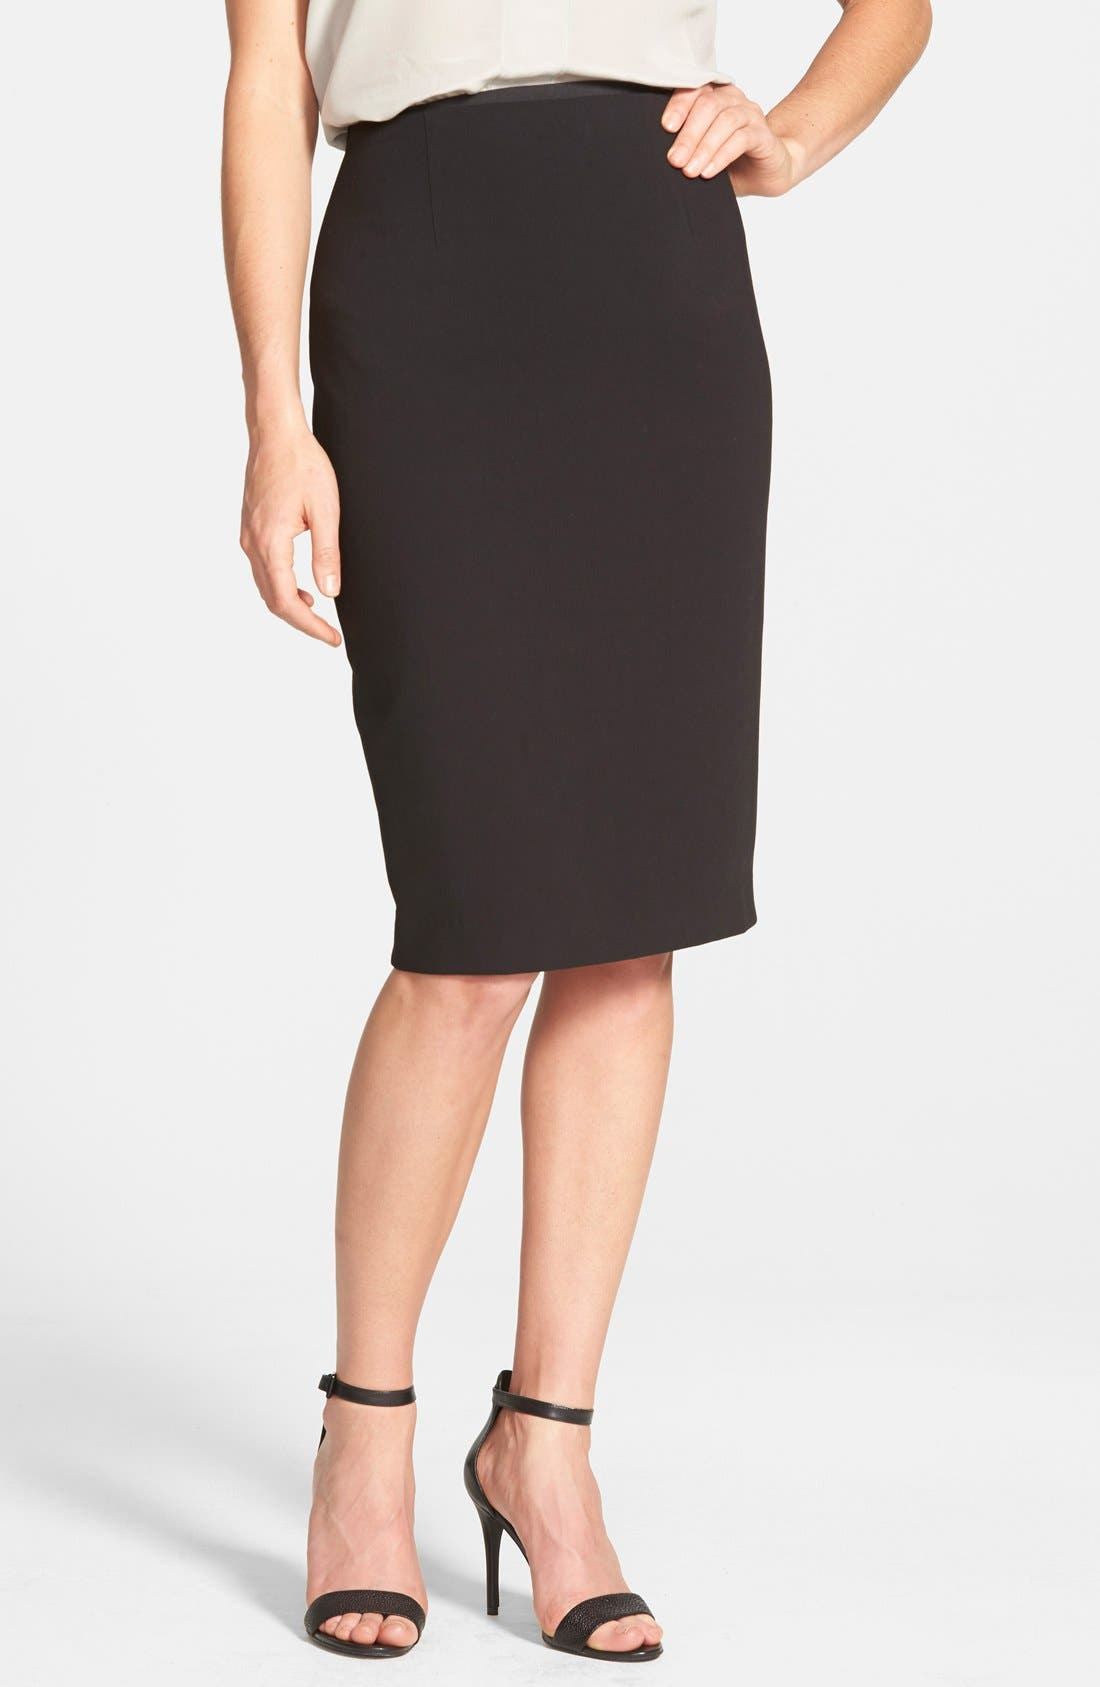 Alternate Image 1 Selected - Halogen® High Waist Pencil Skirt (Regular & Petite)